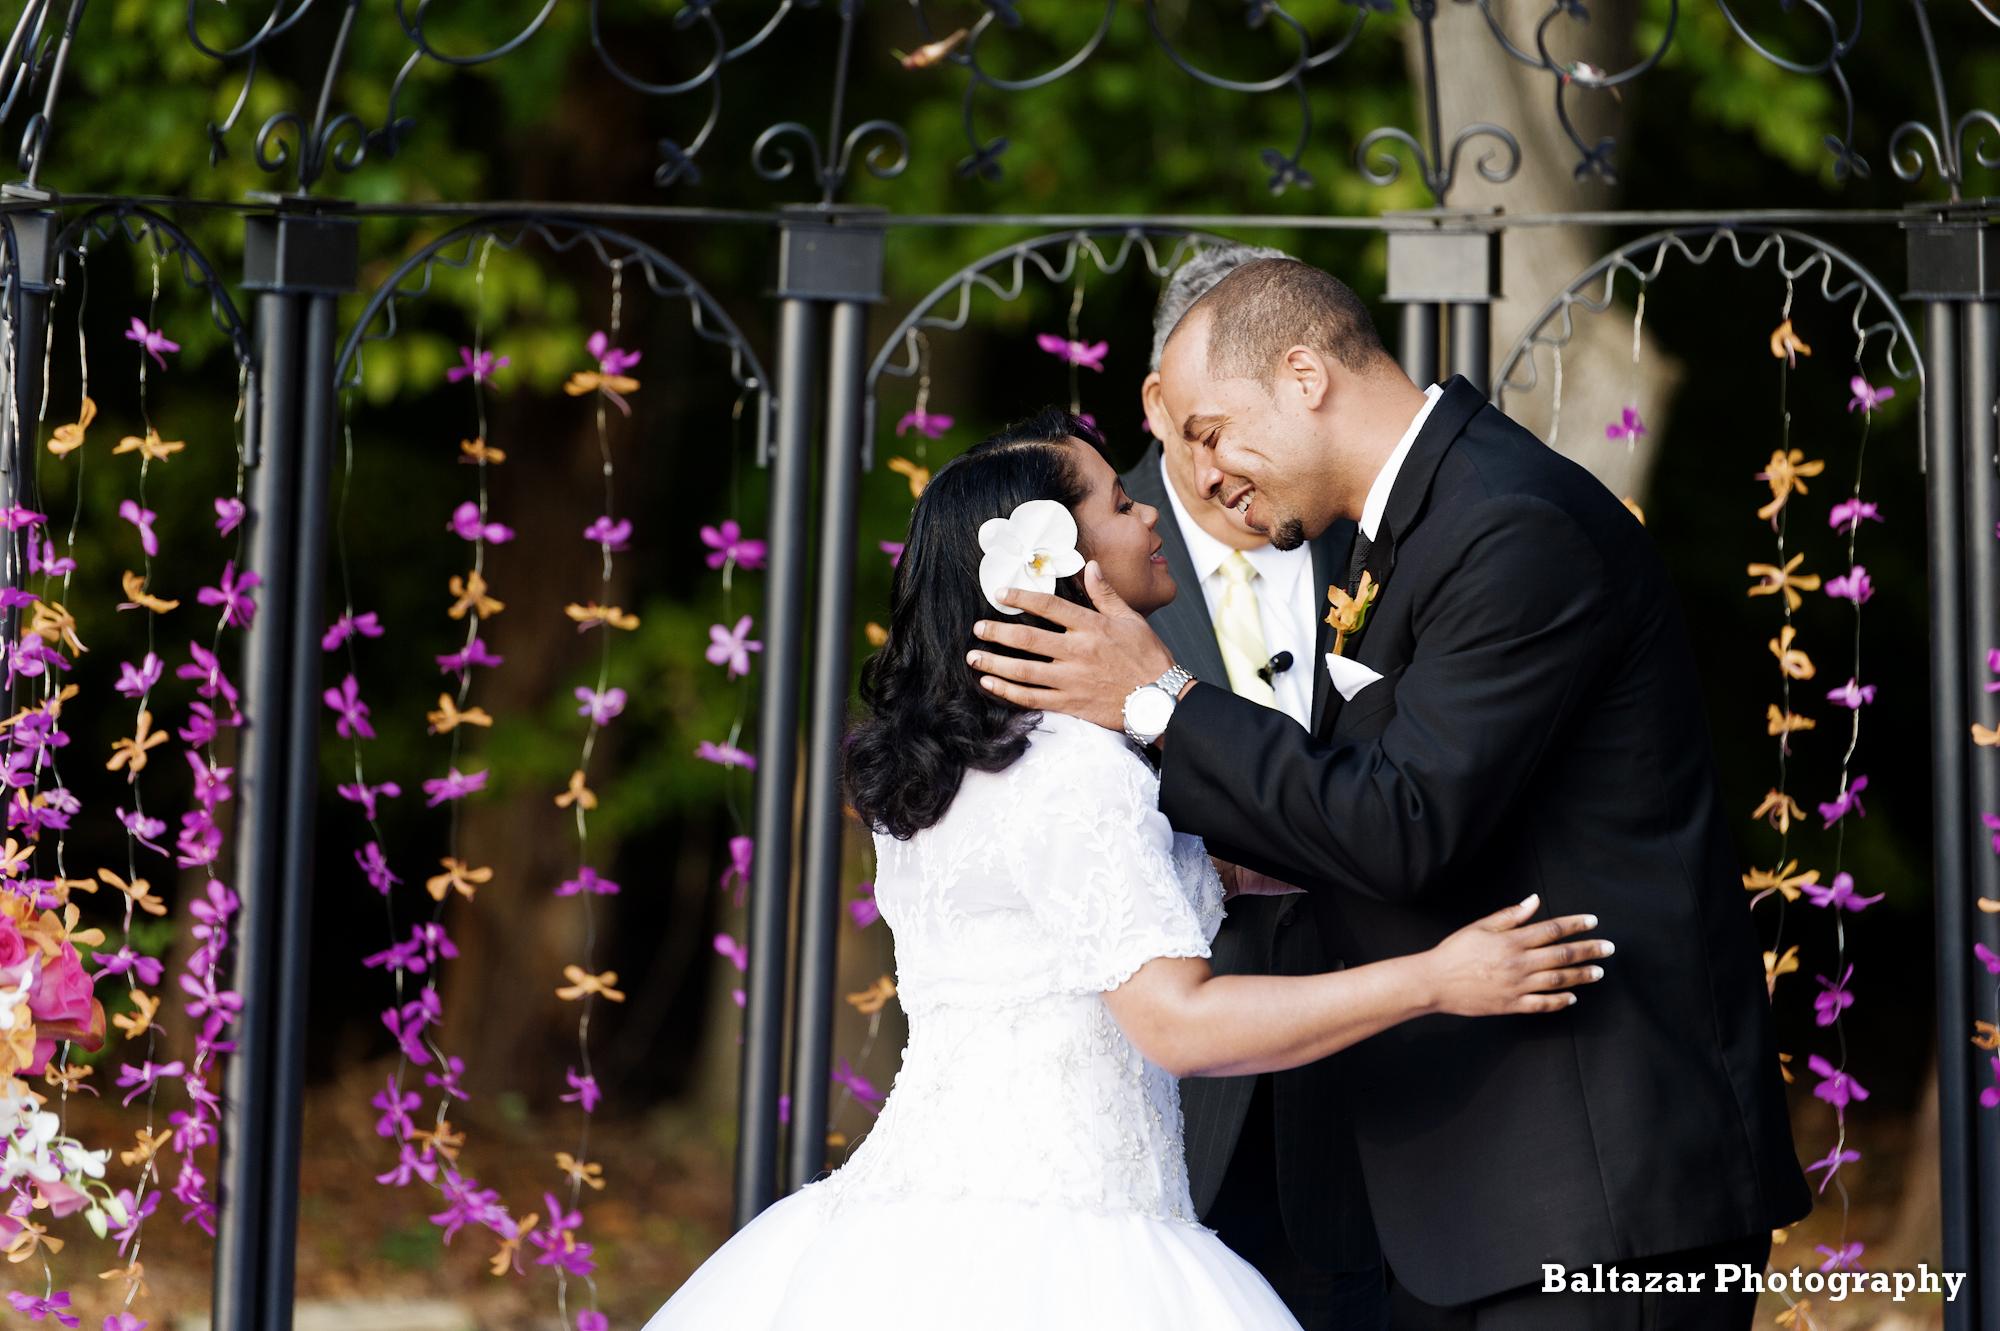 Pure Elegance Events Home Page Slideshow Image 5.jpg